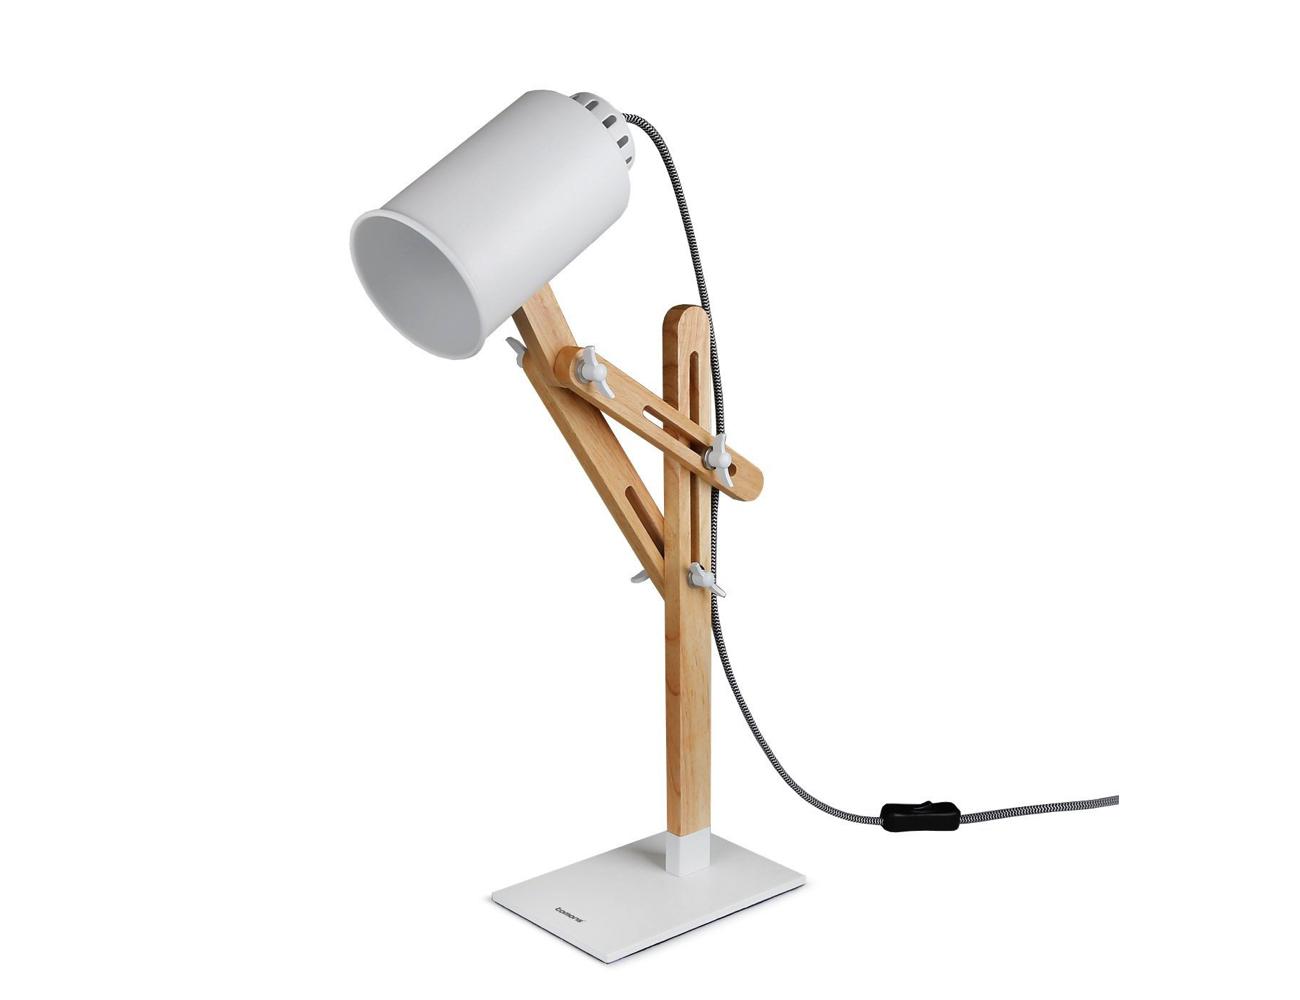 Tomons LED Multi-Angle Wood Desk Lamp